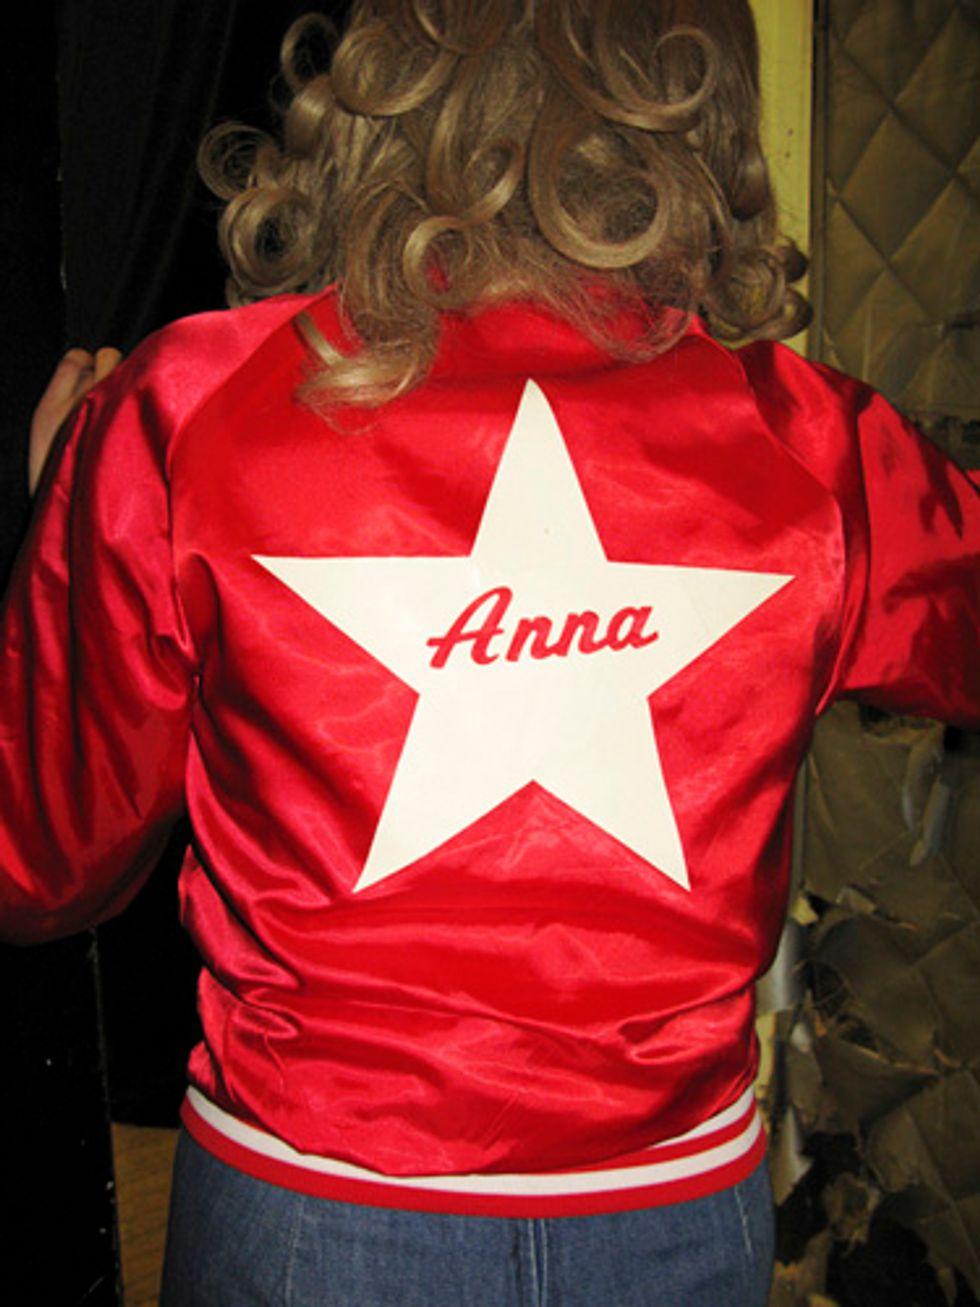 Up in Da Club With Alexander Thompson: The Anna Copa Cabanna Show